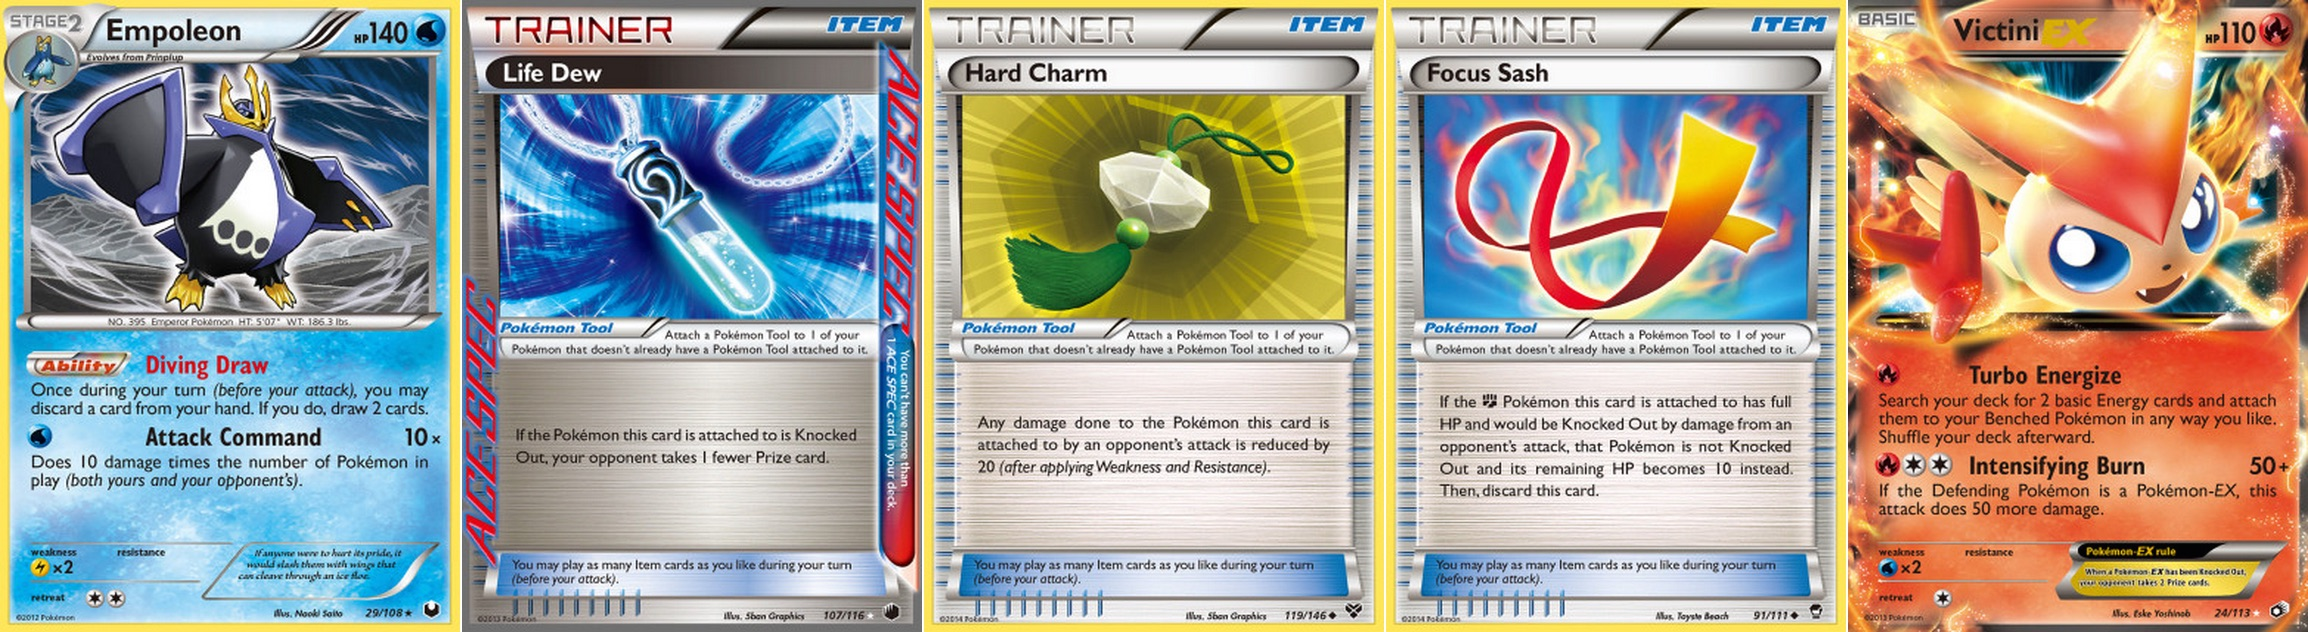 erik nance tech cards